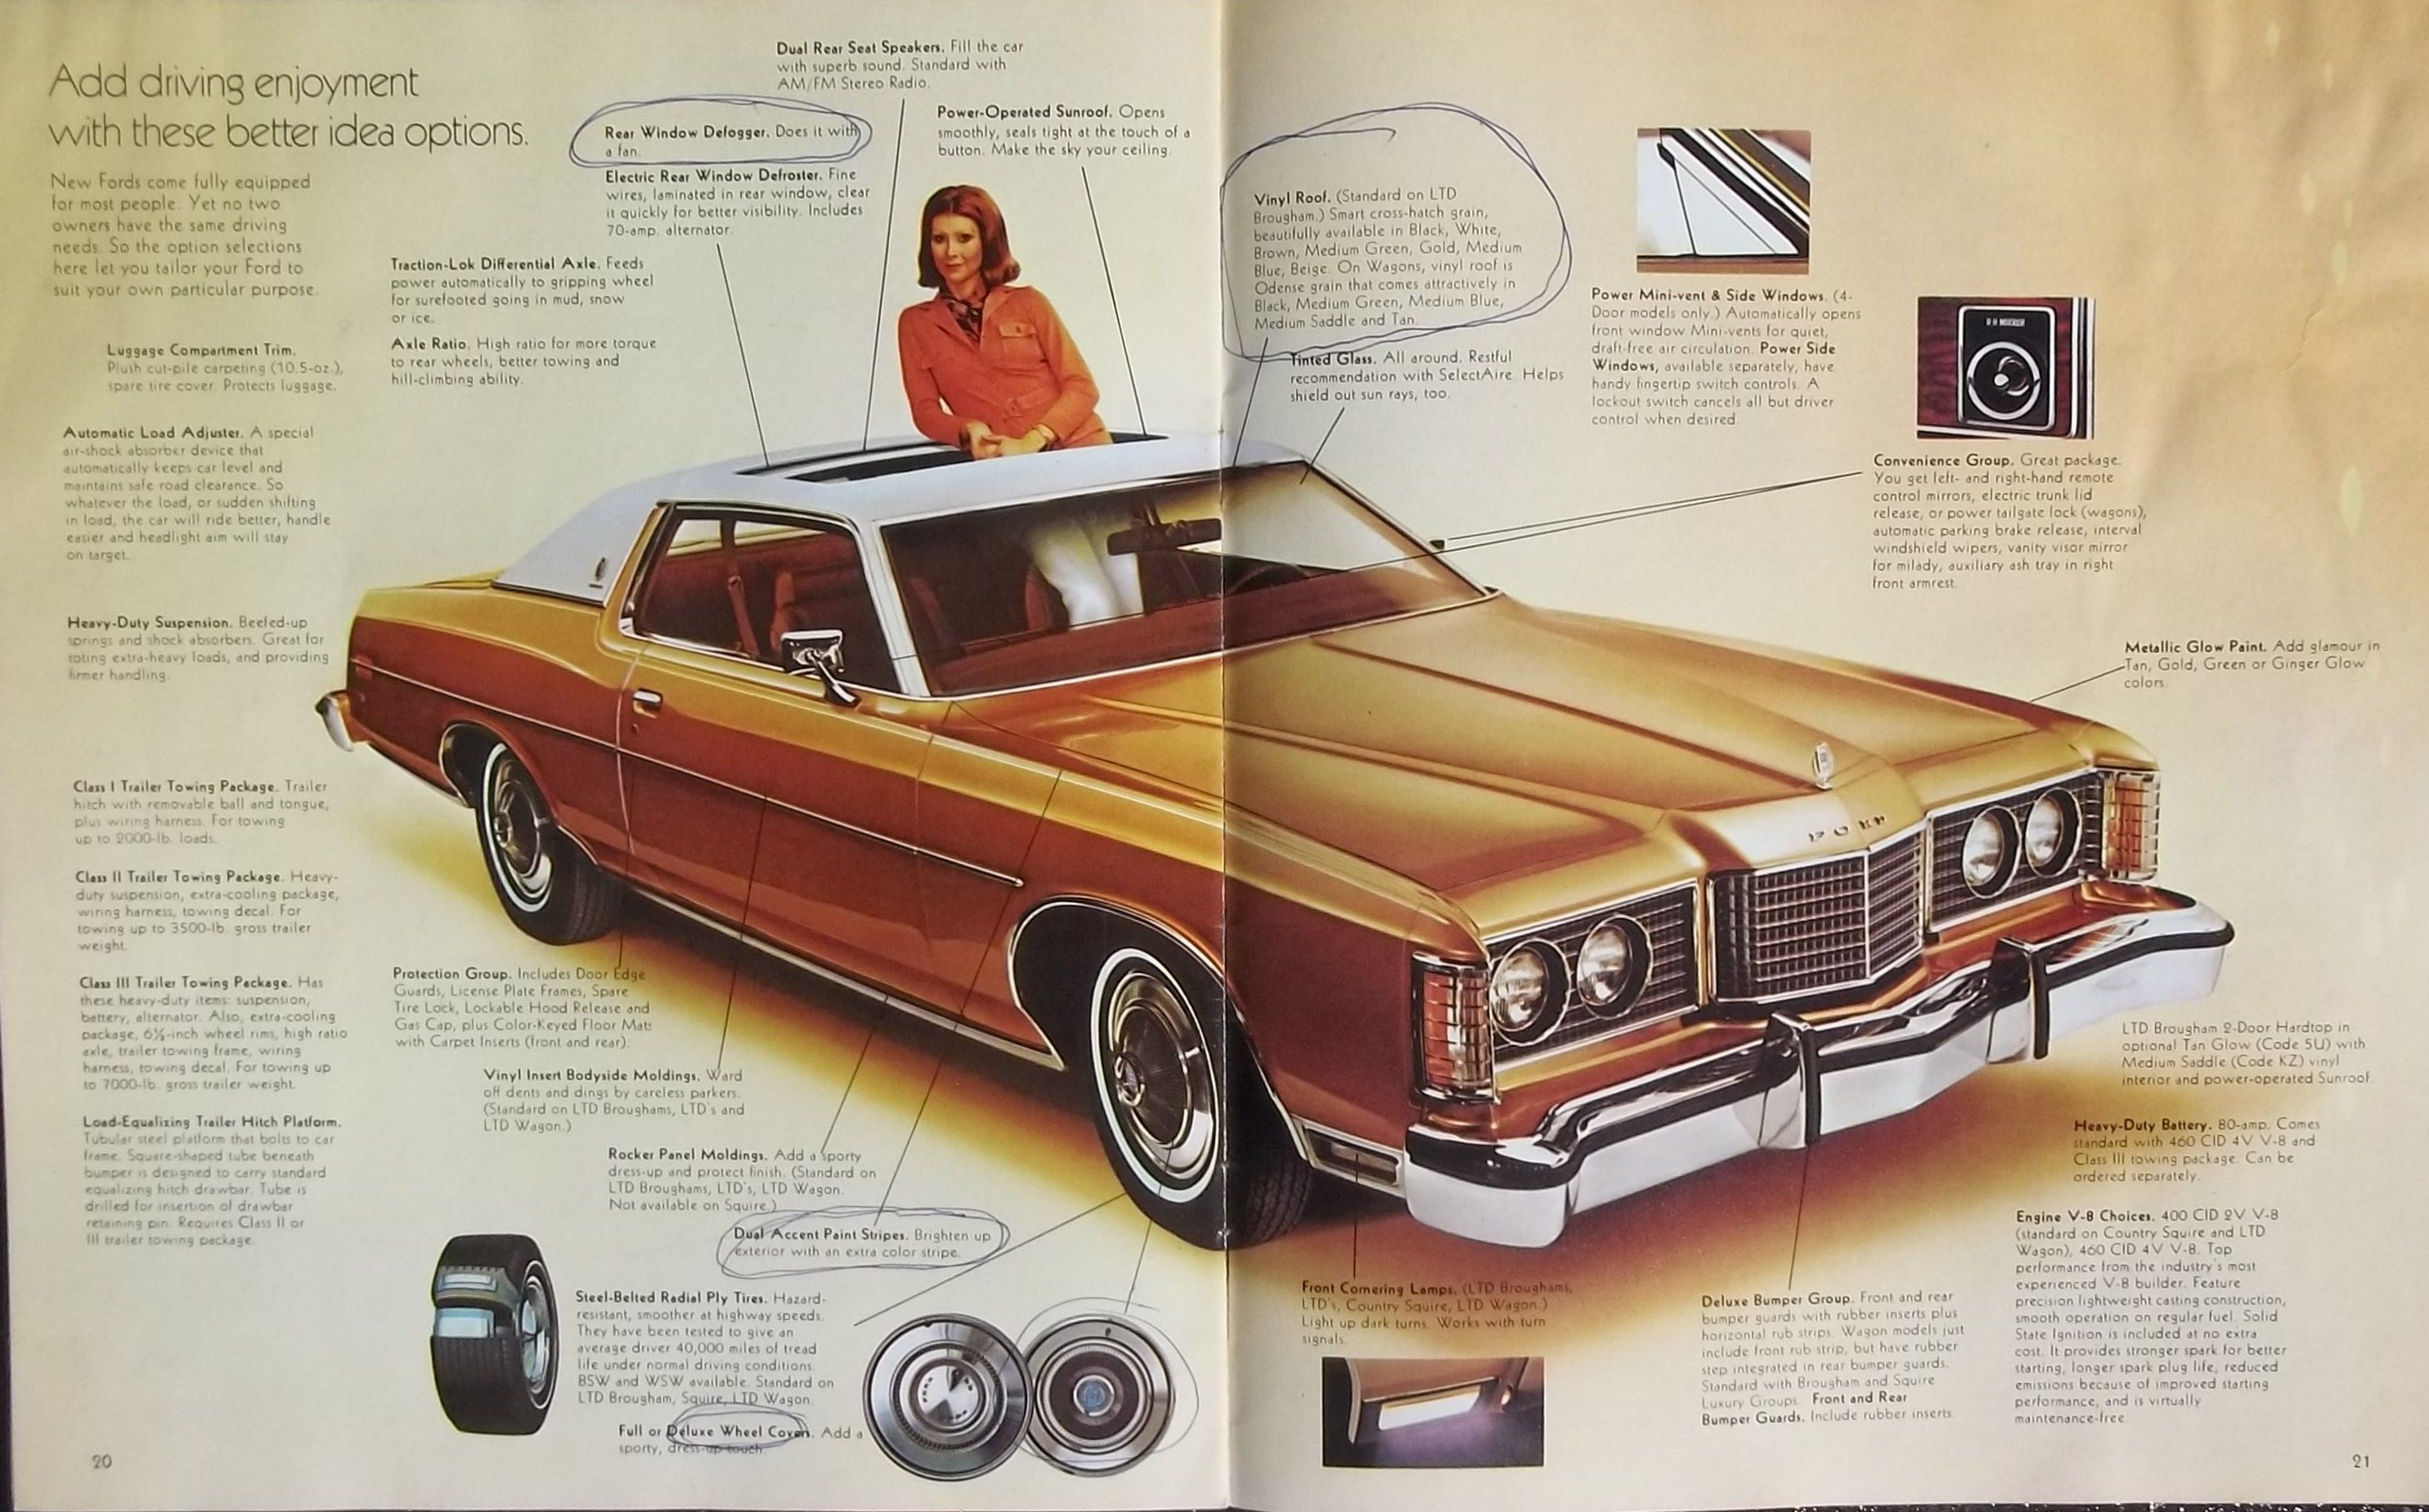 1974 ford ltd brougham ltd galaxie 500 custom 500 and station wagon highlights [ 2970 x 1849 Pixel ]